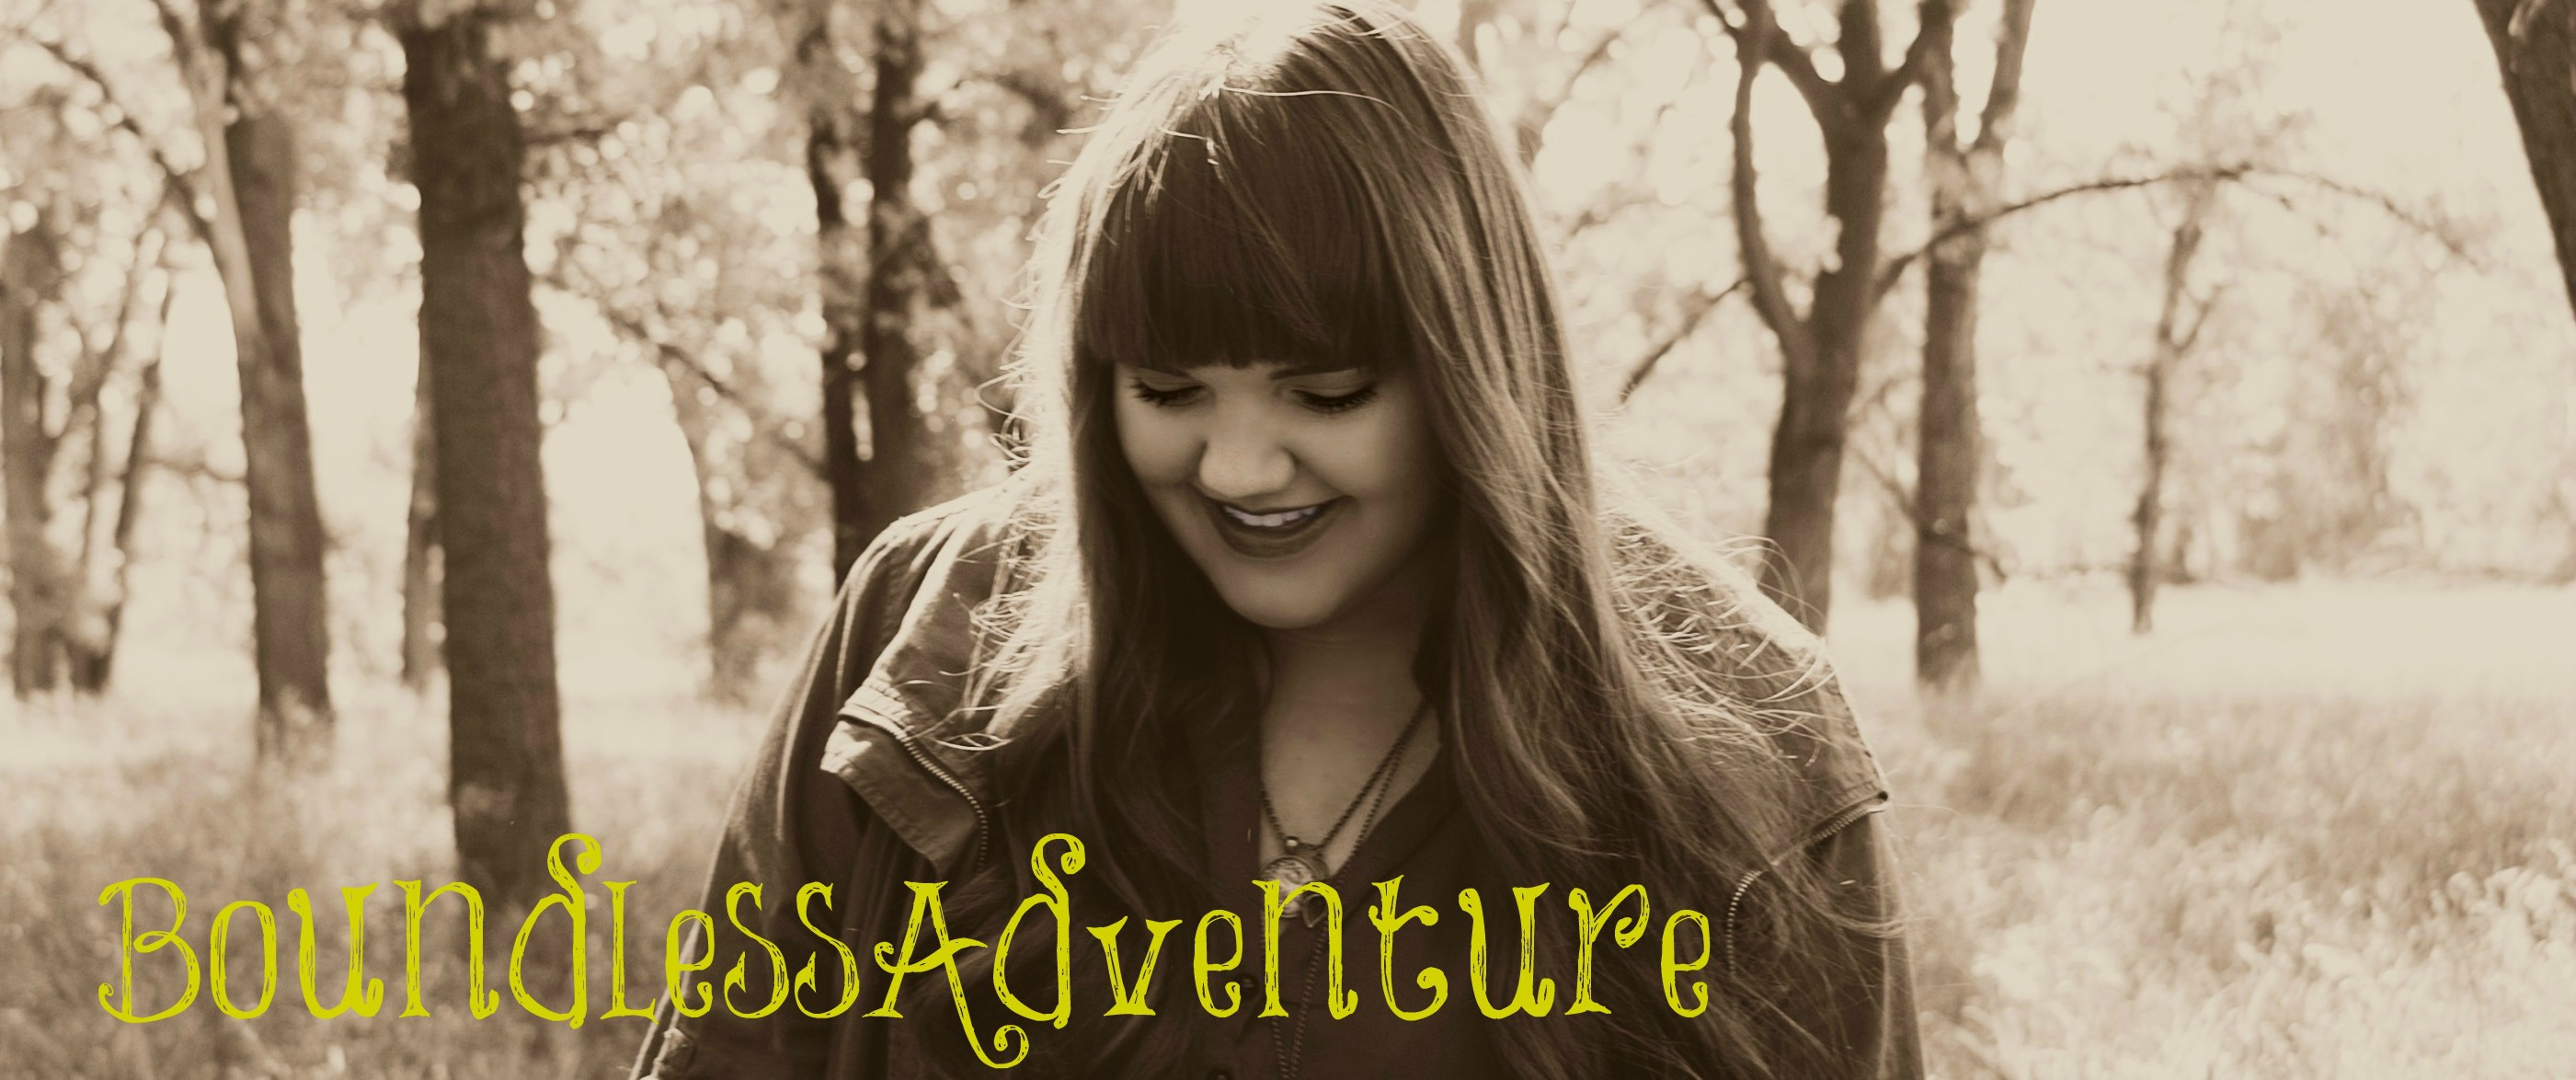 BoundlessAdventure